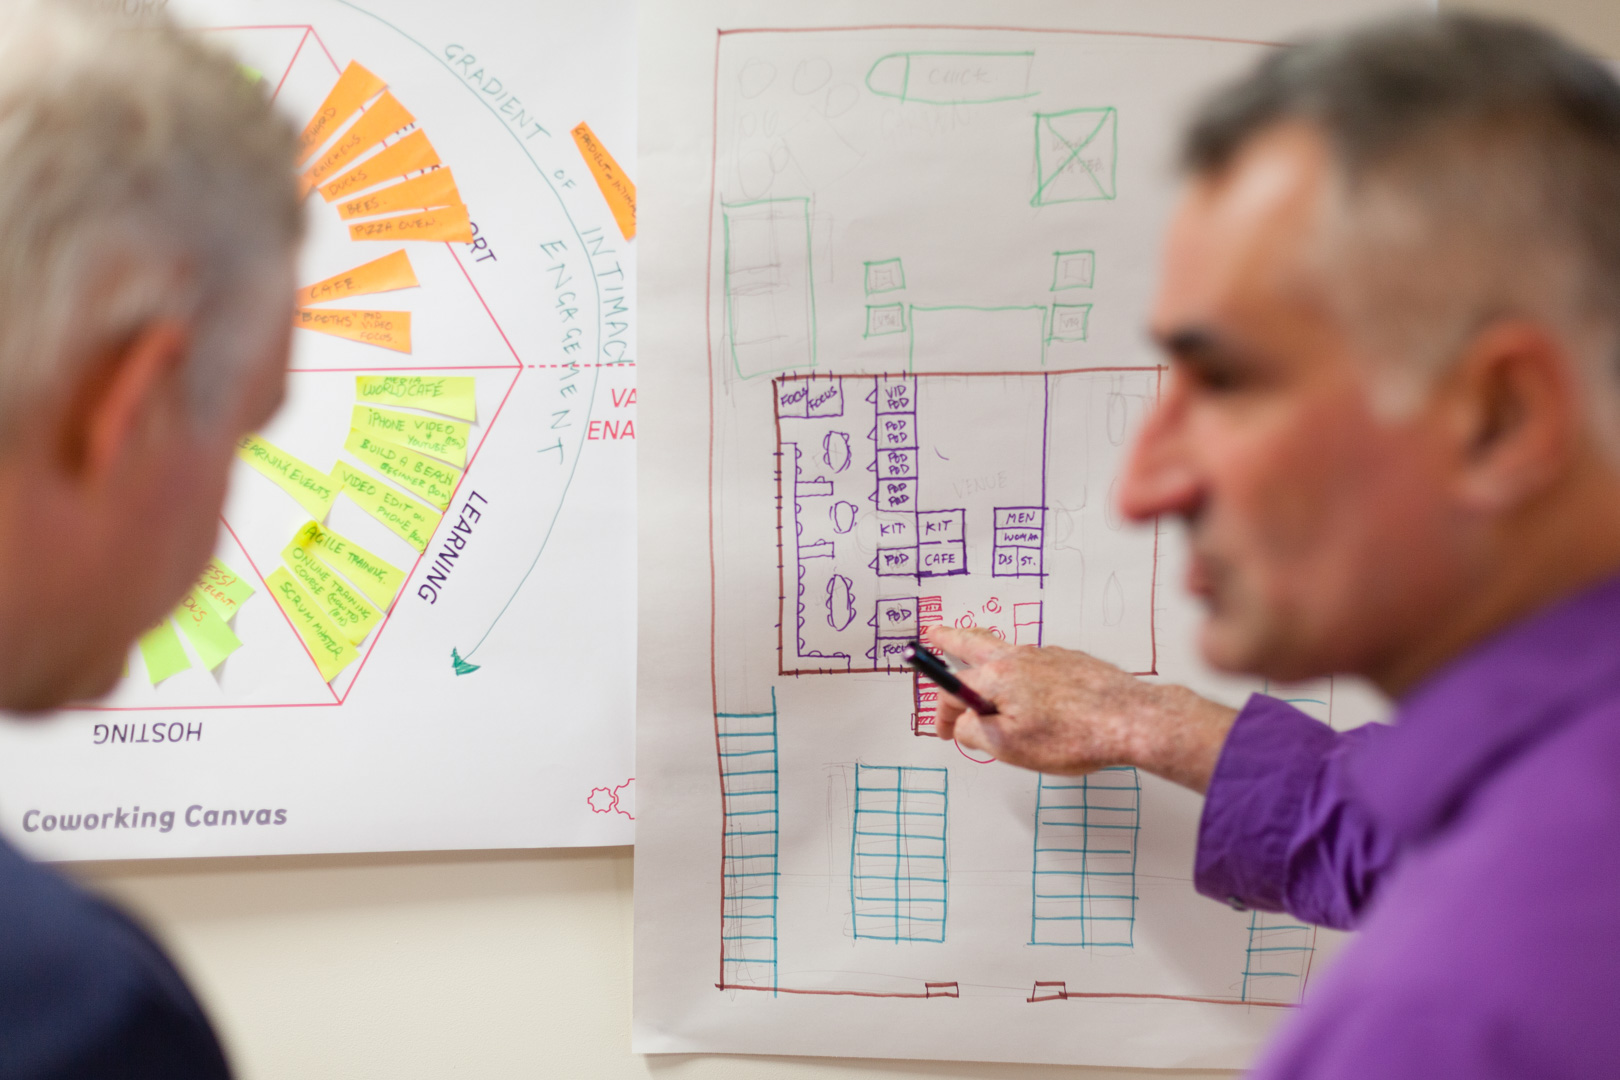 Darius explaning floorplan to Cass